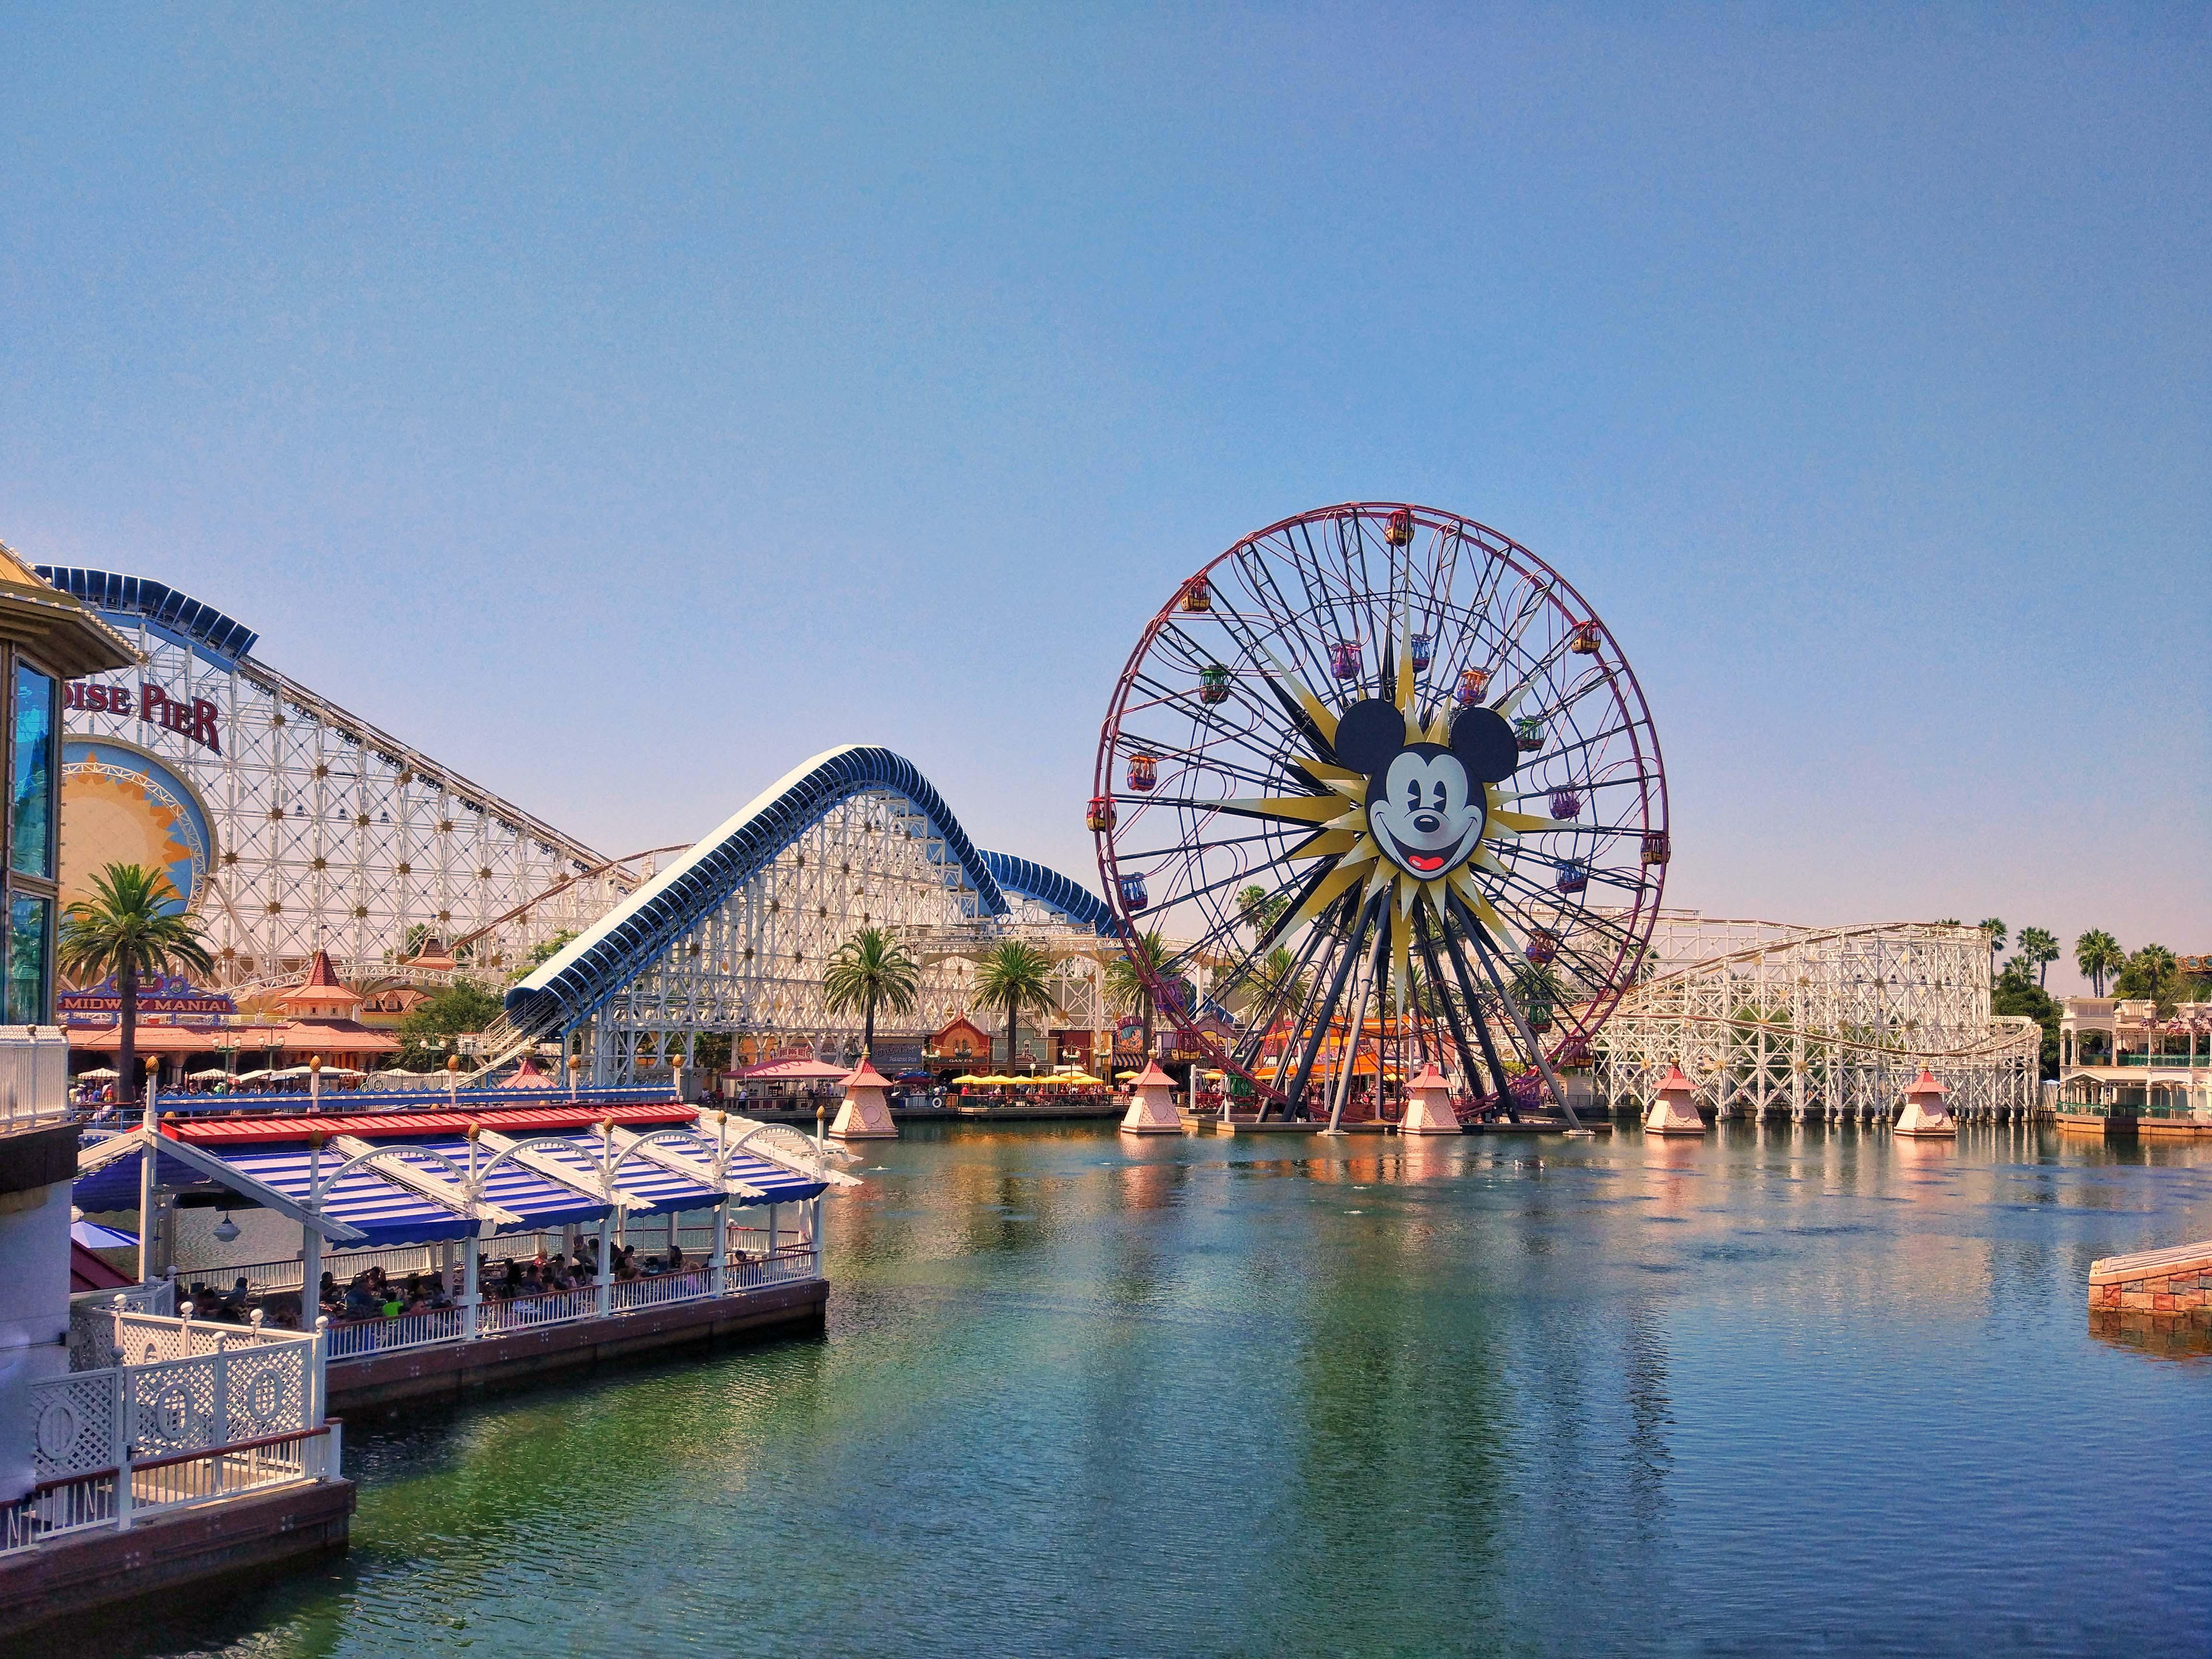 Disneyland California Tickets 1 Day Disneyland Ticket For Disneyland California Adventure